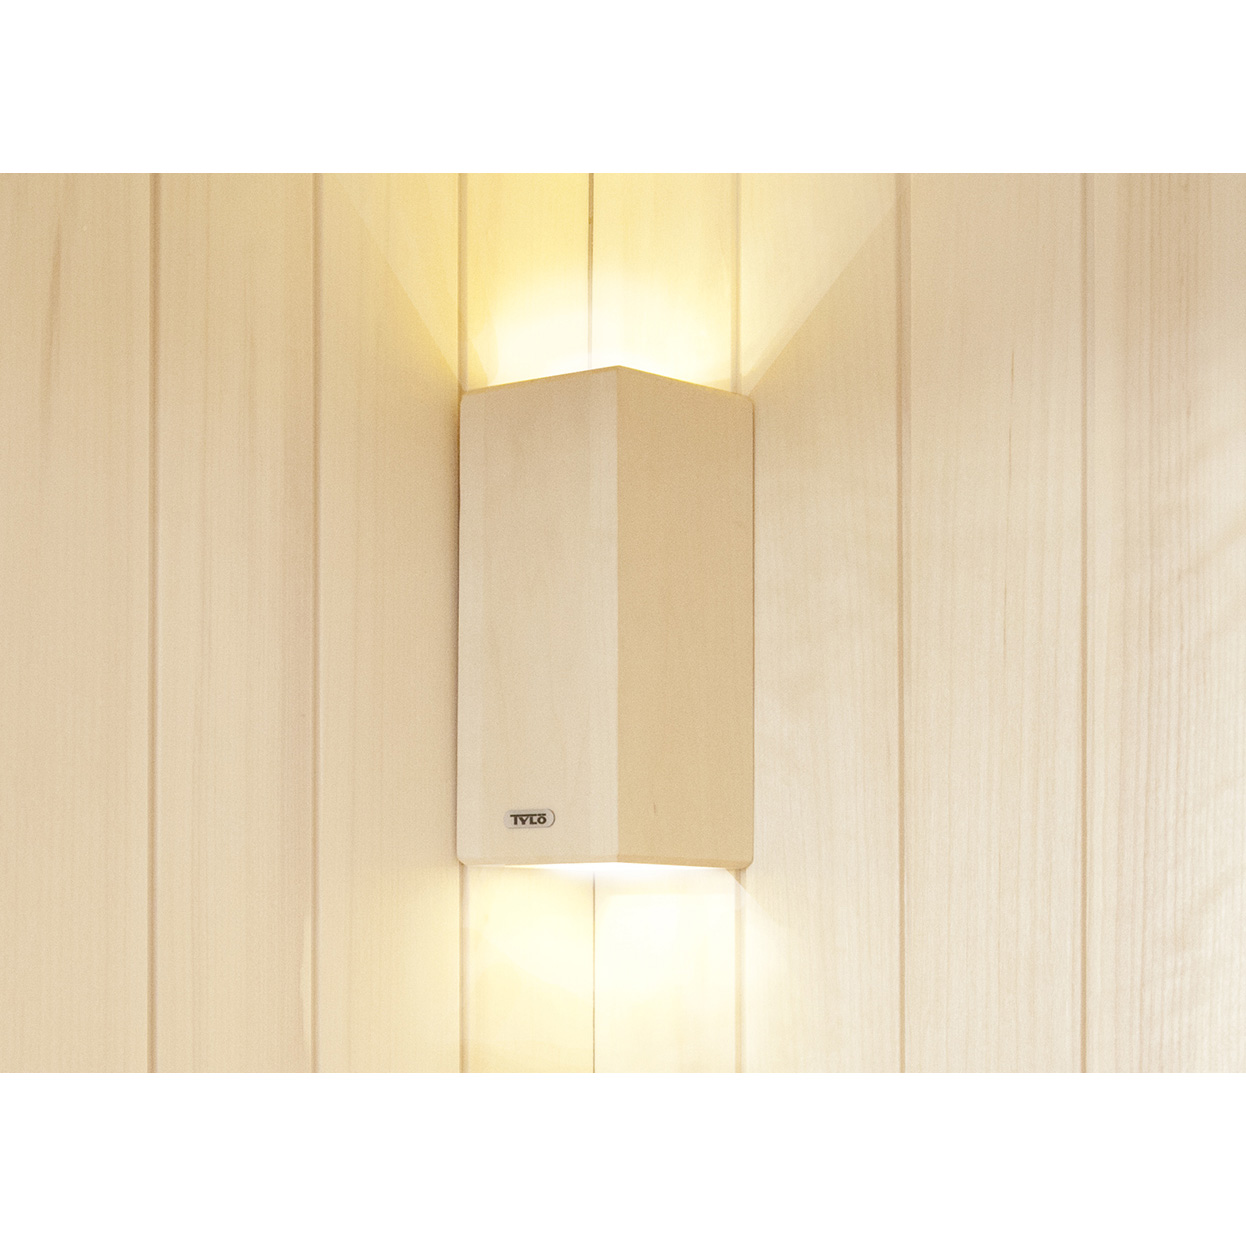 TYLO Светильник для сауны Е90 0.8 W, арт. 90011420